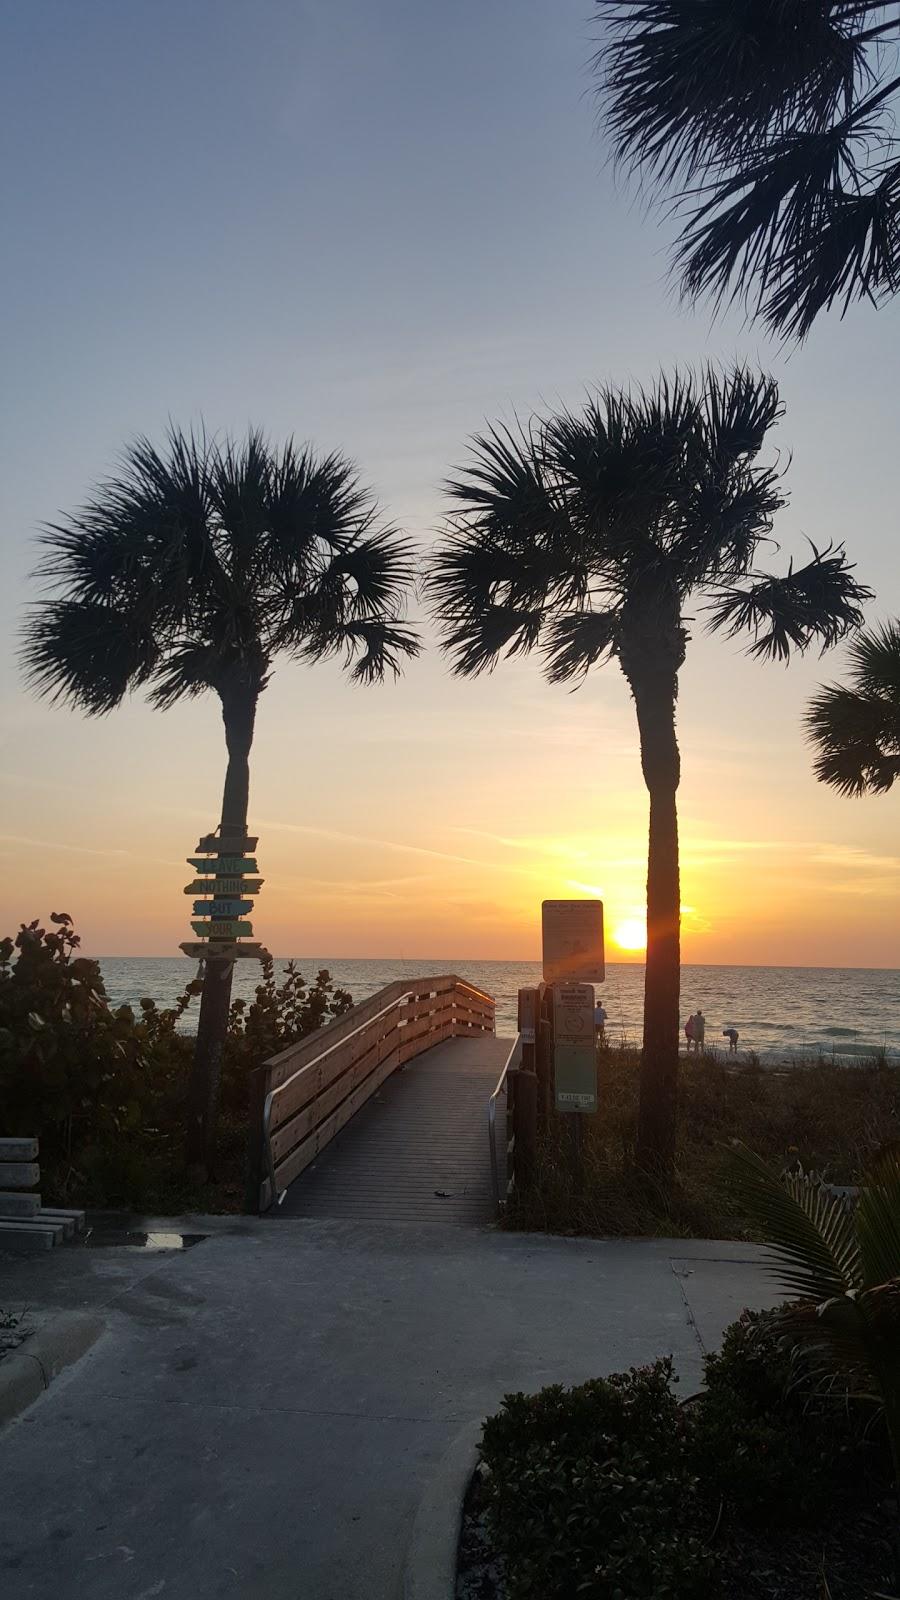 Barrett Beach Bungalows - real estate agency  | Photo 7 of 10 | Address: 19646 Gulf Blvd, Indian Shores, FL 33785, USA | Phone: (727) 455-2832